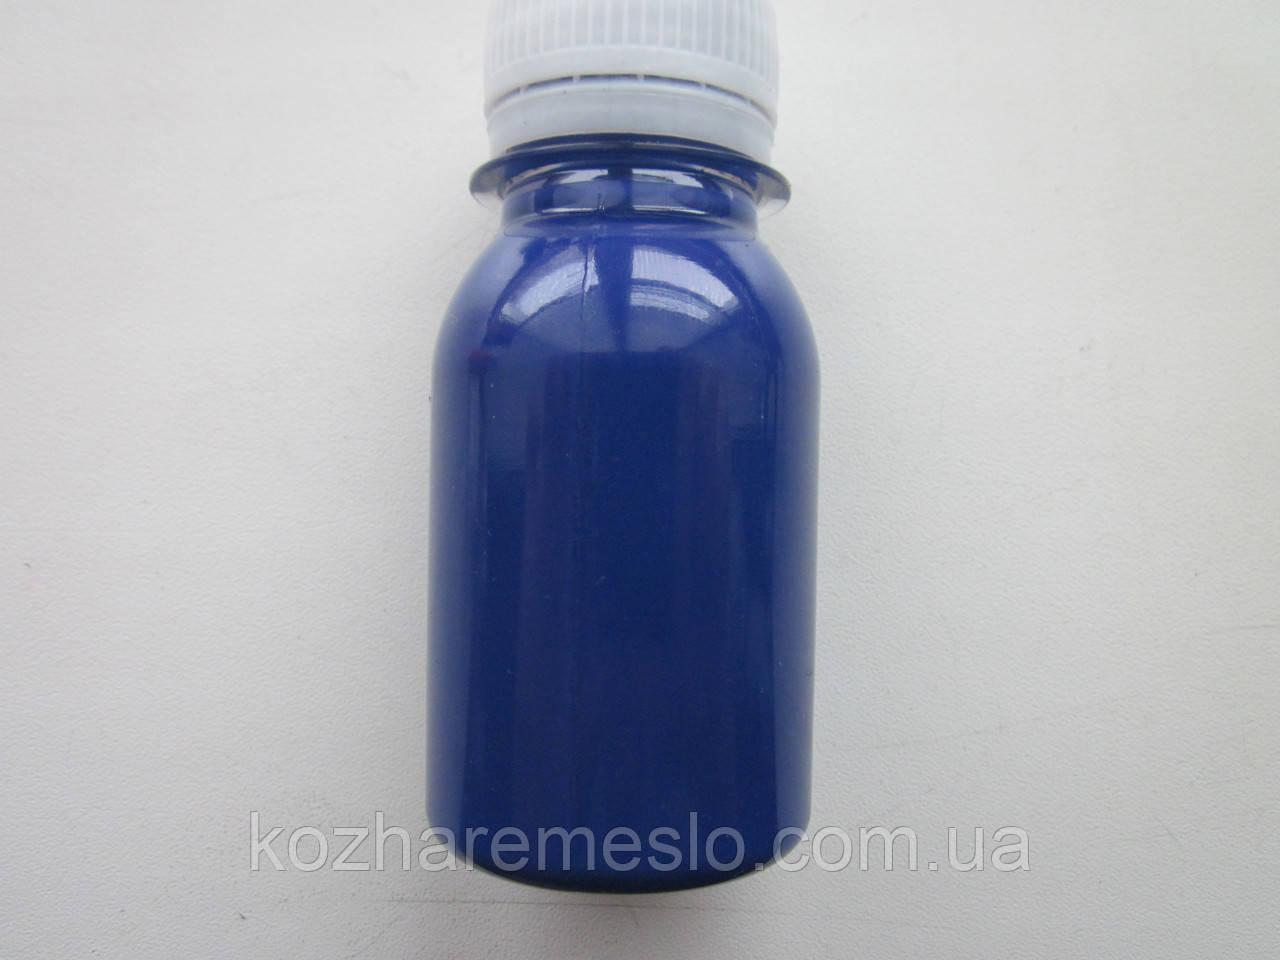 Краска для уреза (торца) кожи FENICE на силиконовой основе 200 грам синяя